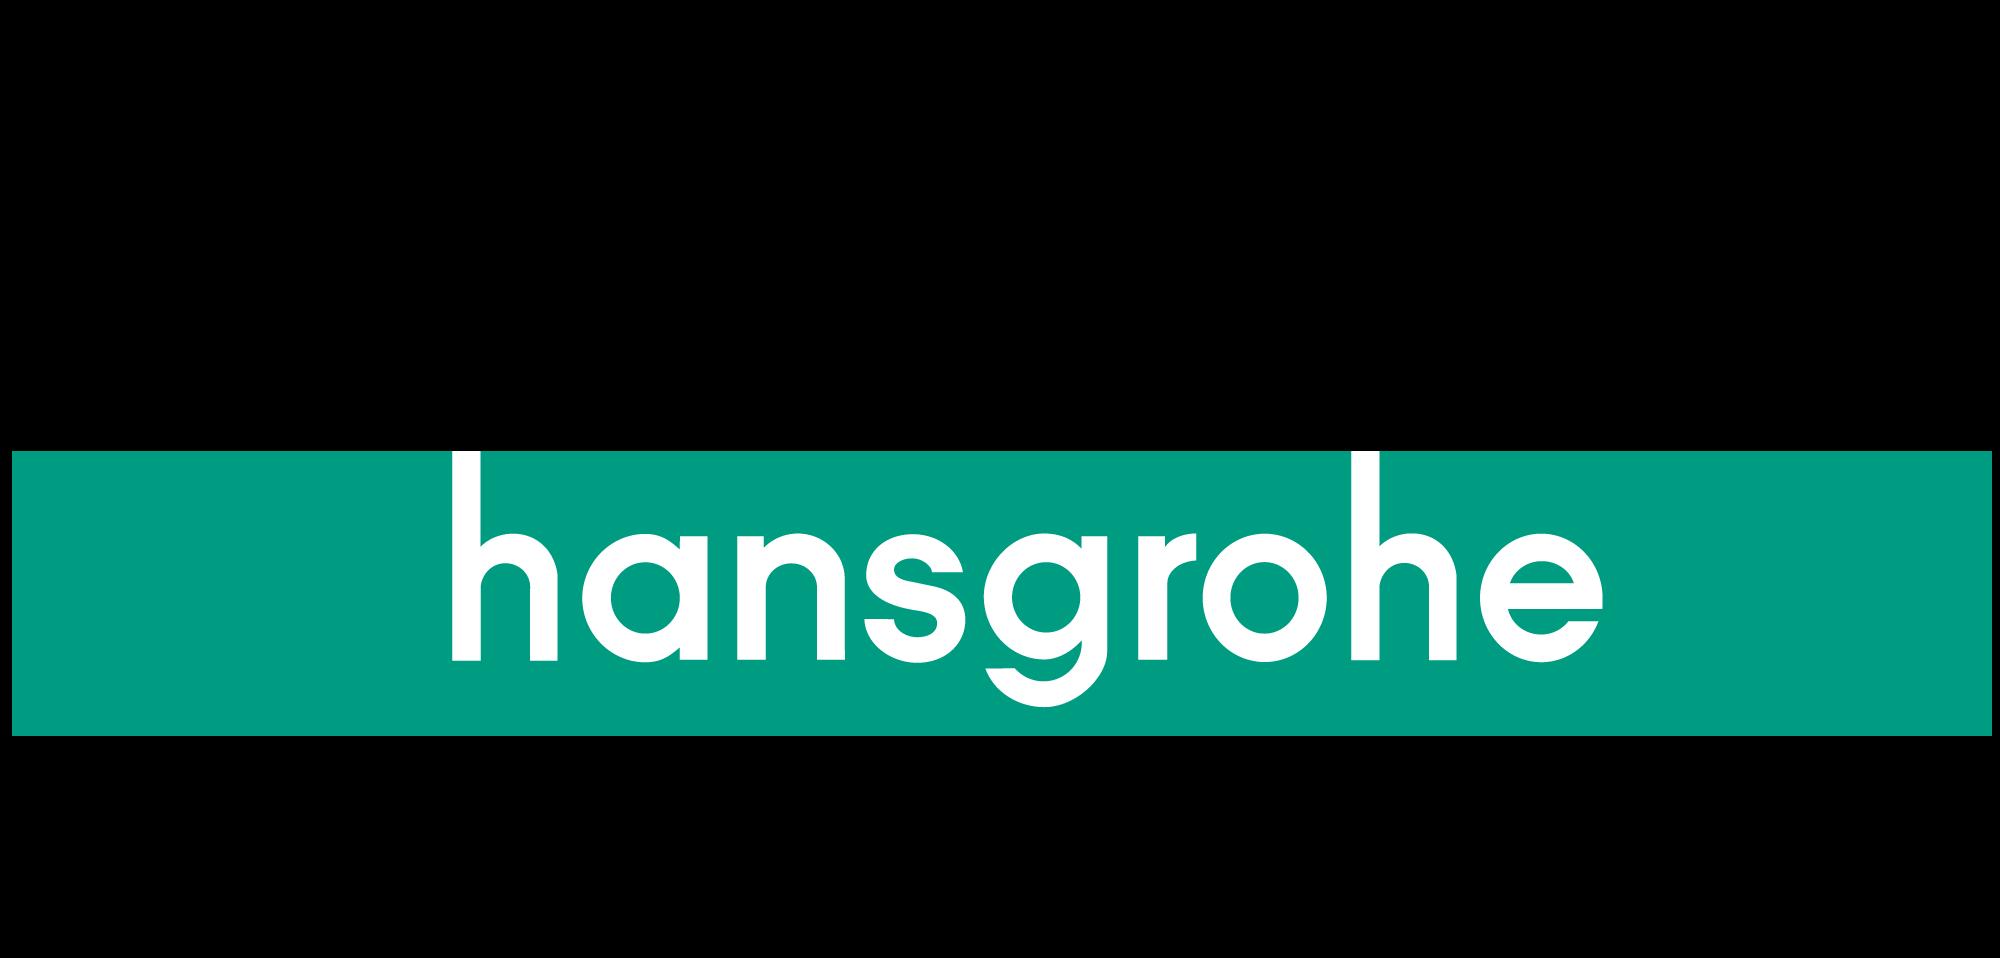 Team BORA-hansgrohe